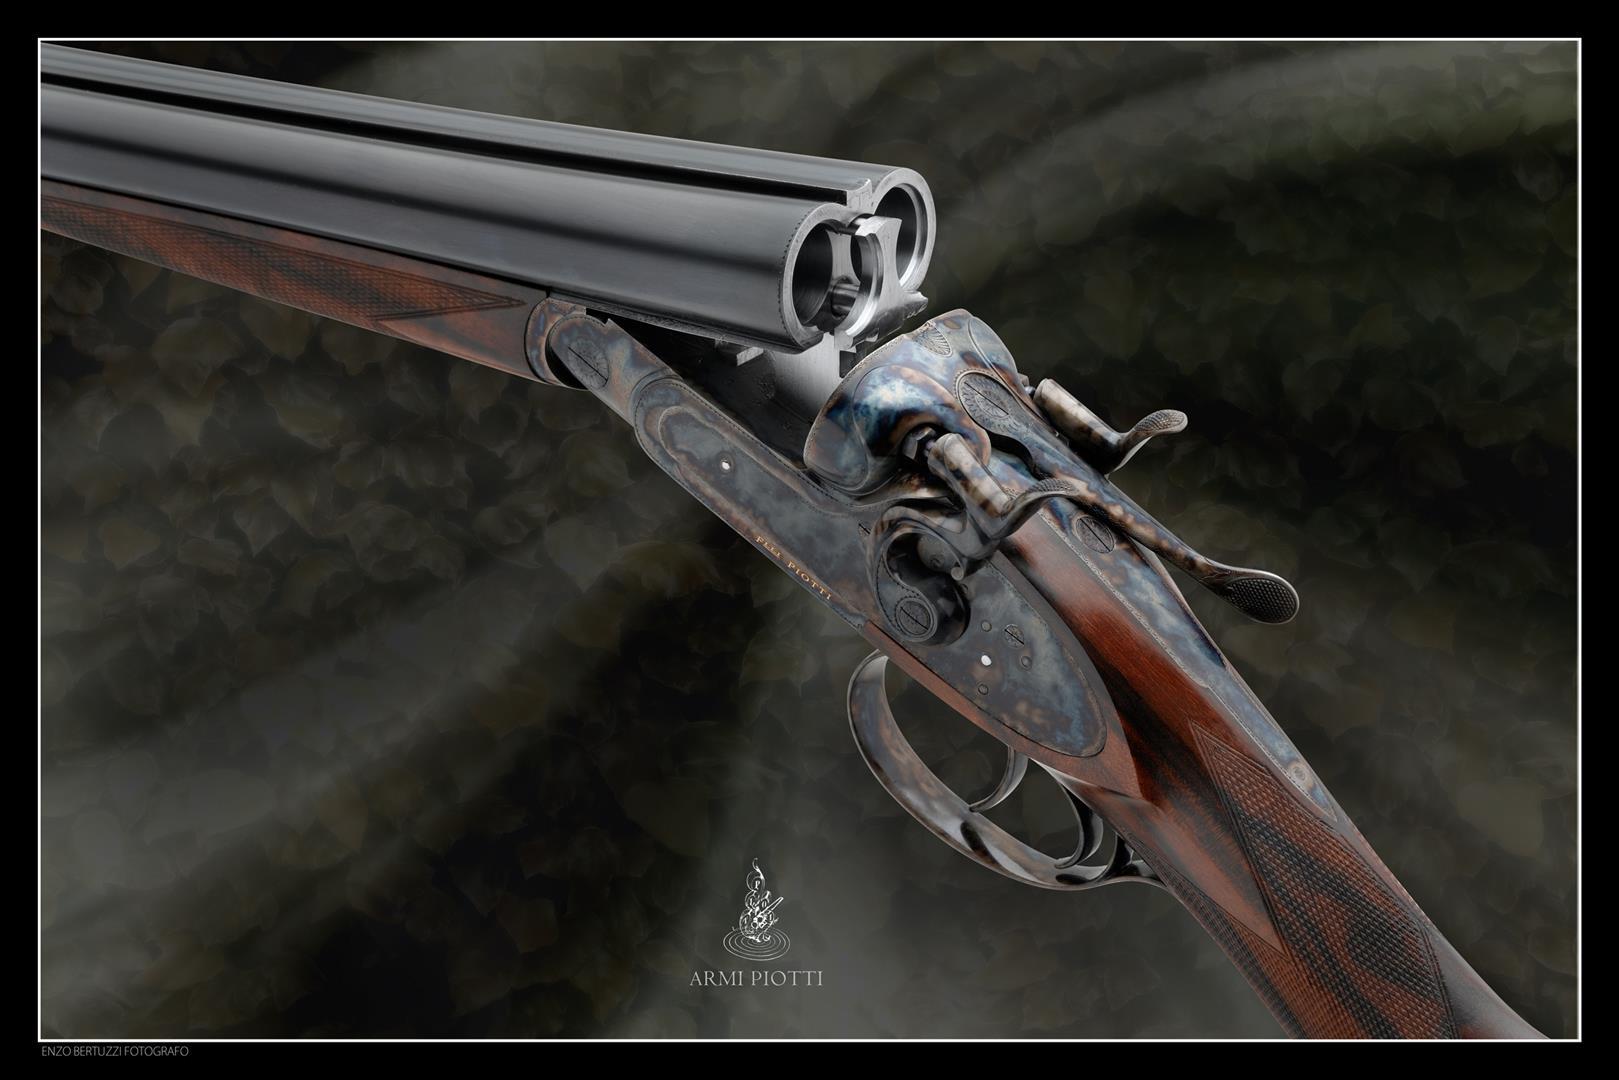 Piotti hammer shotgun